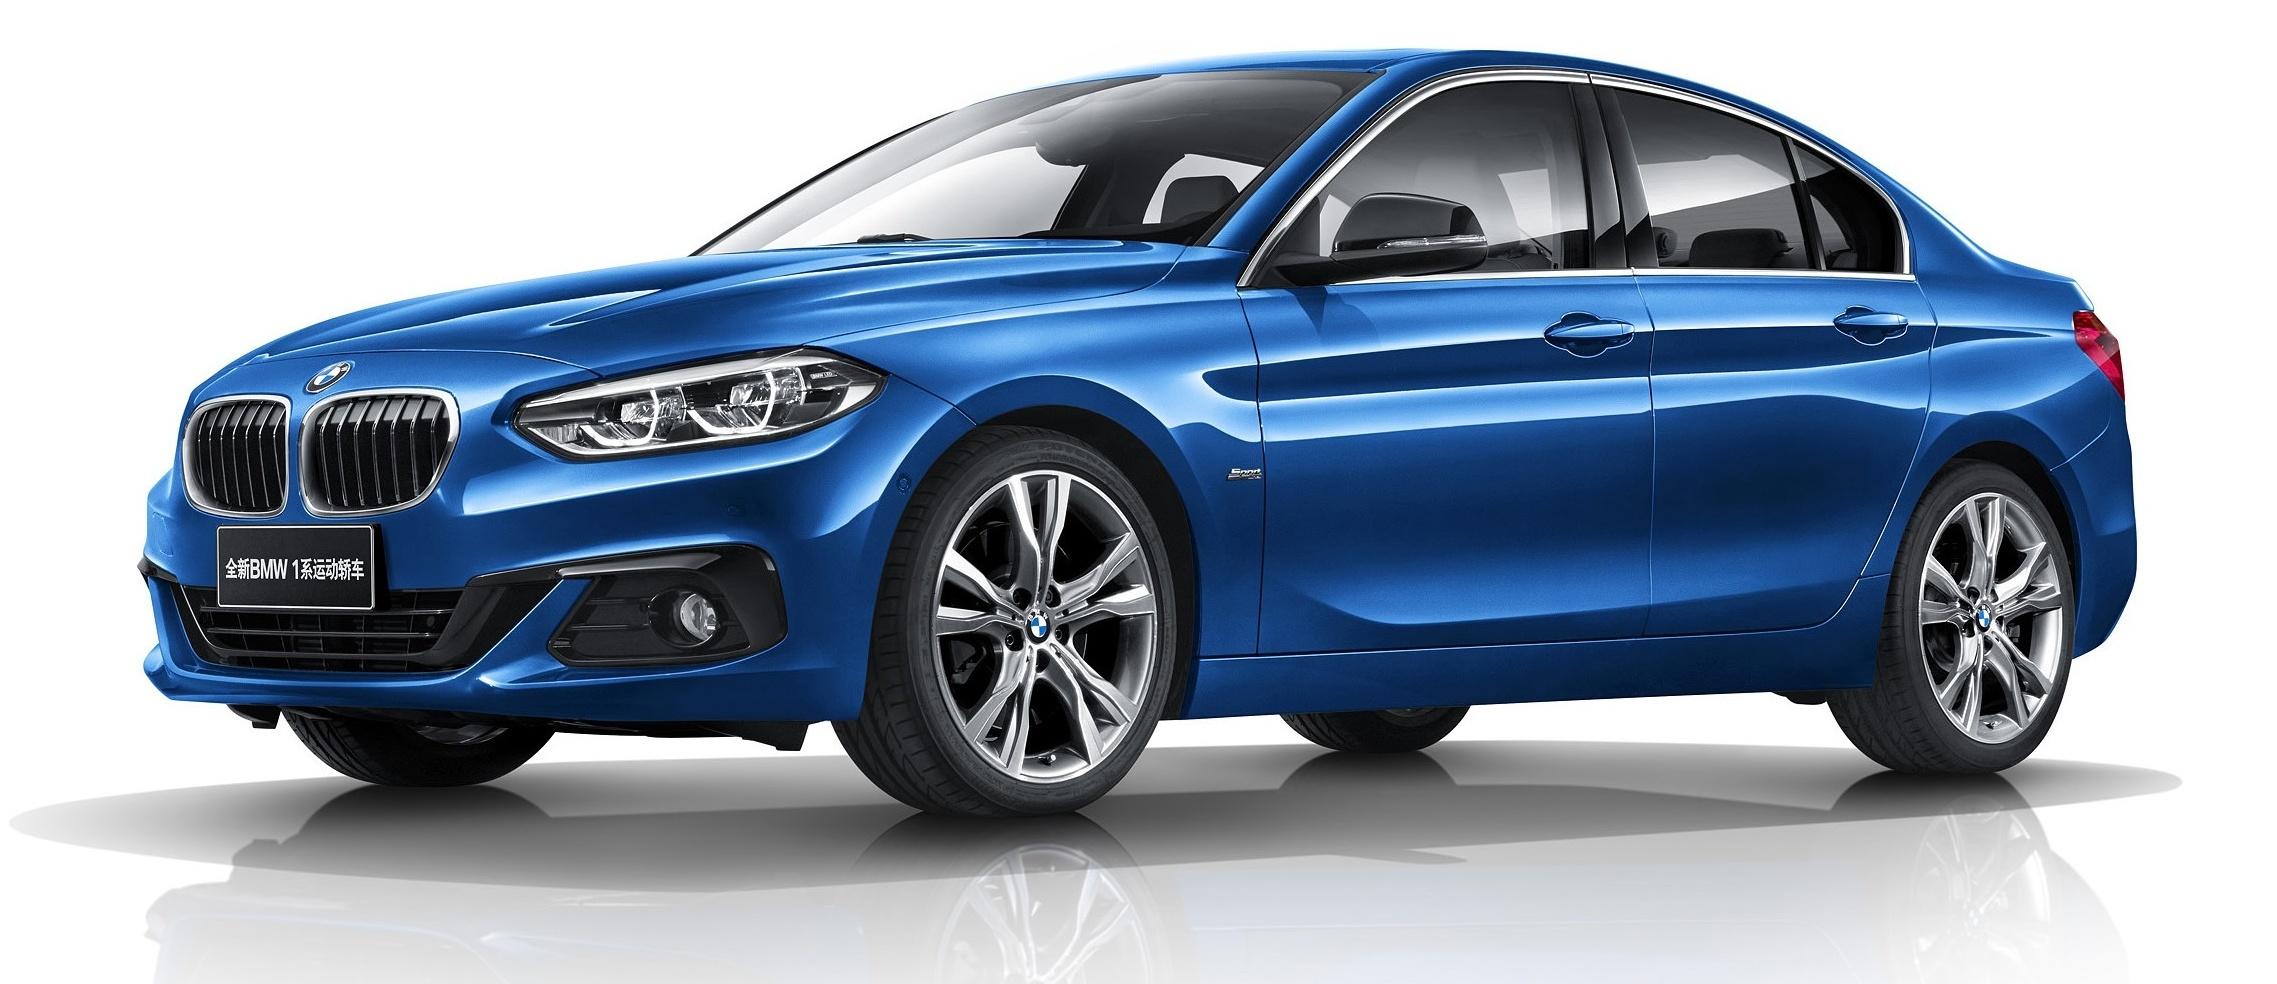 Series >> BMW 1 Series Sedan 中国上市,全车系使用前轮驱动。 BMW-1-Series-Sedan-06-e1488254931367 - Paul Tan 汽车资讯网